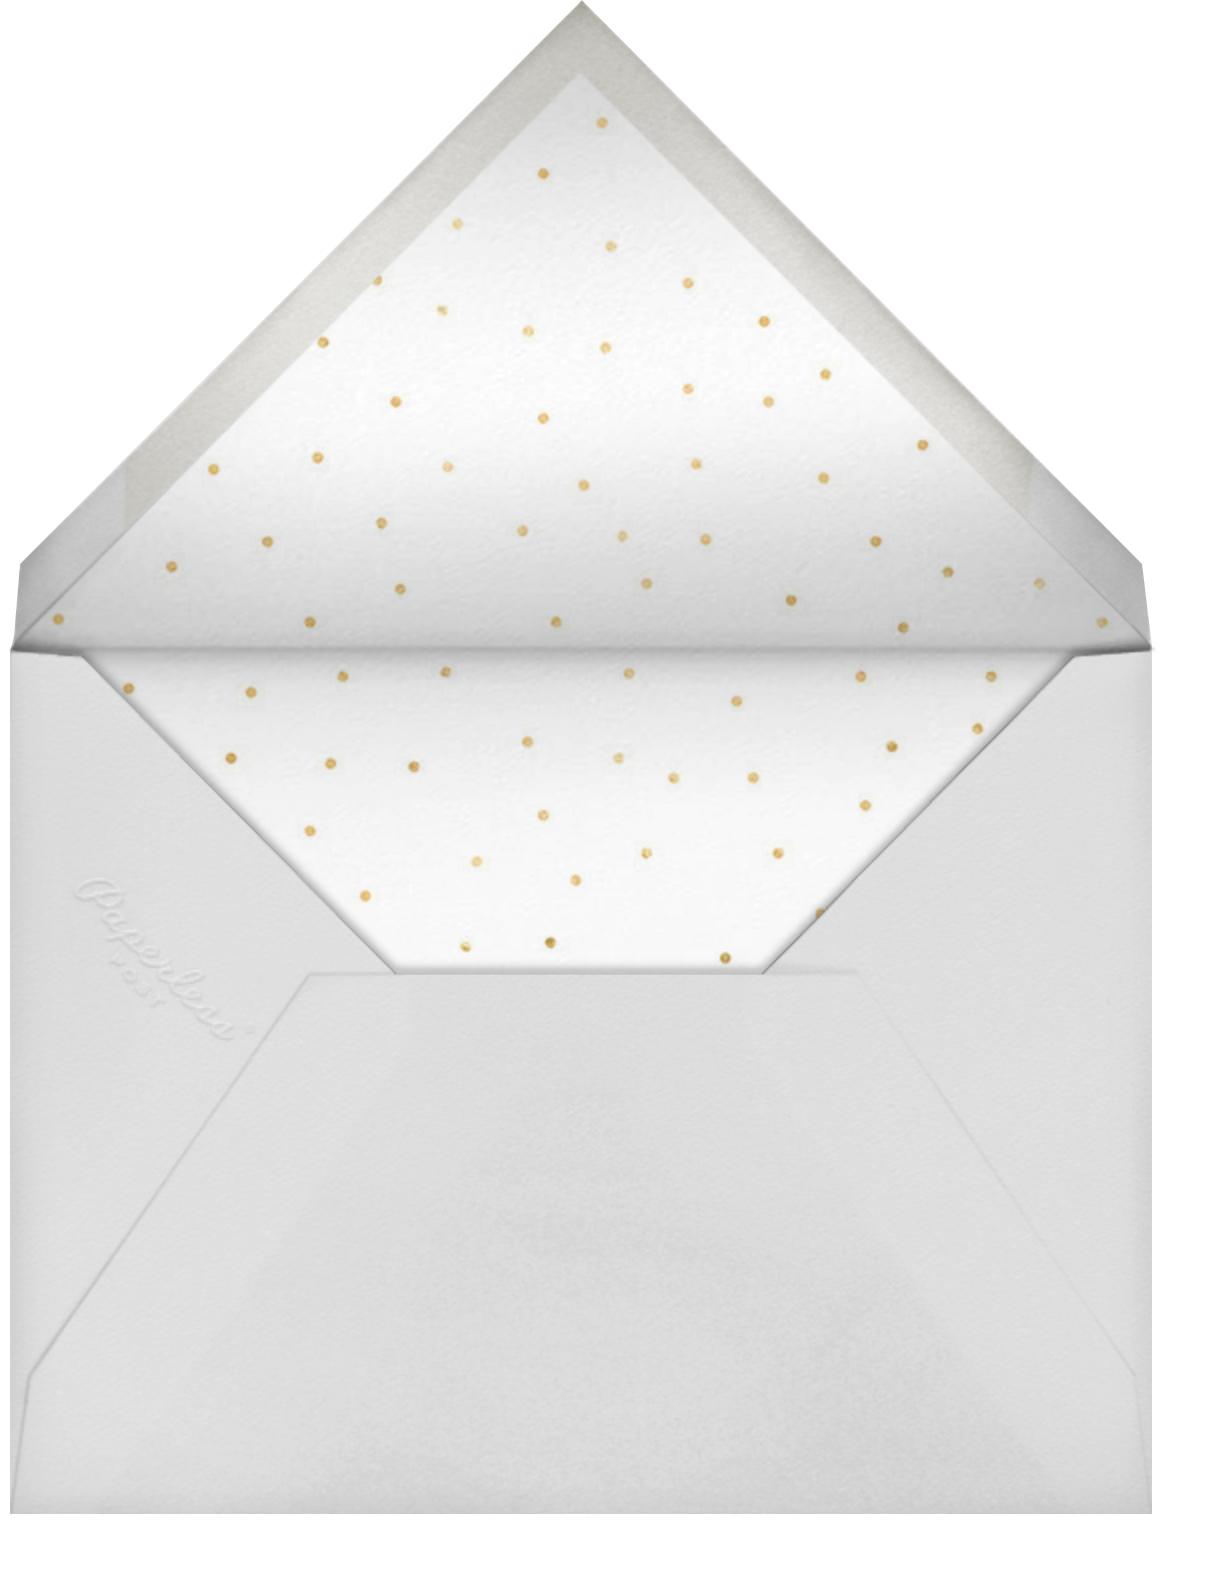 Chimney Smoke - Cheree Berry - Company holiday cards - envelope back